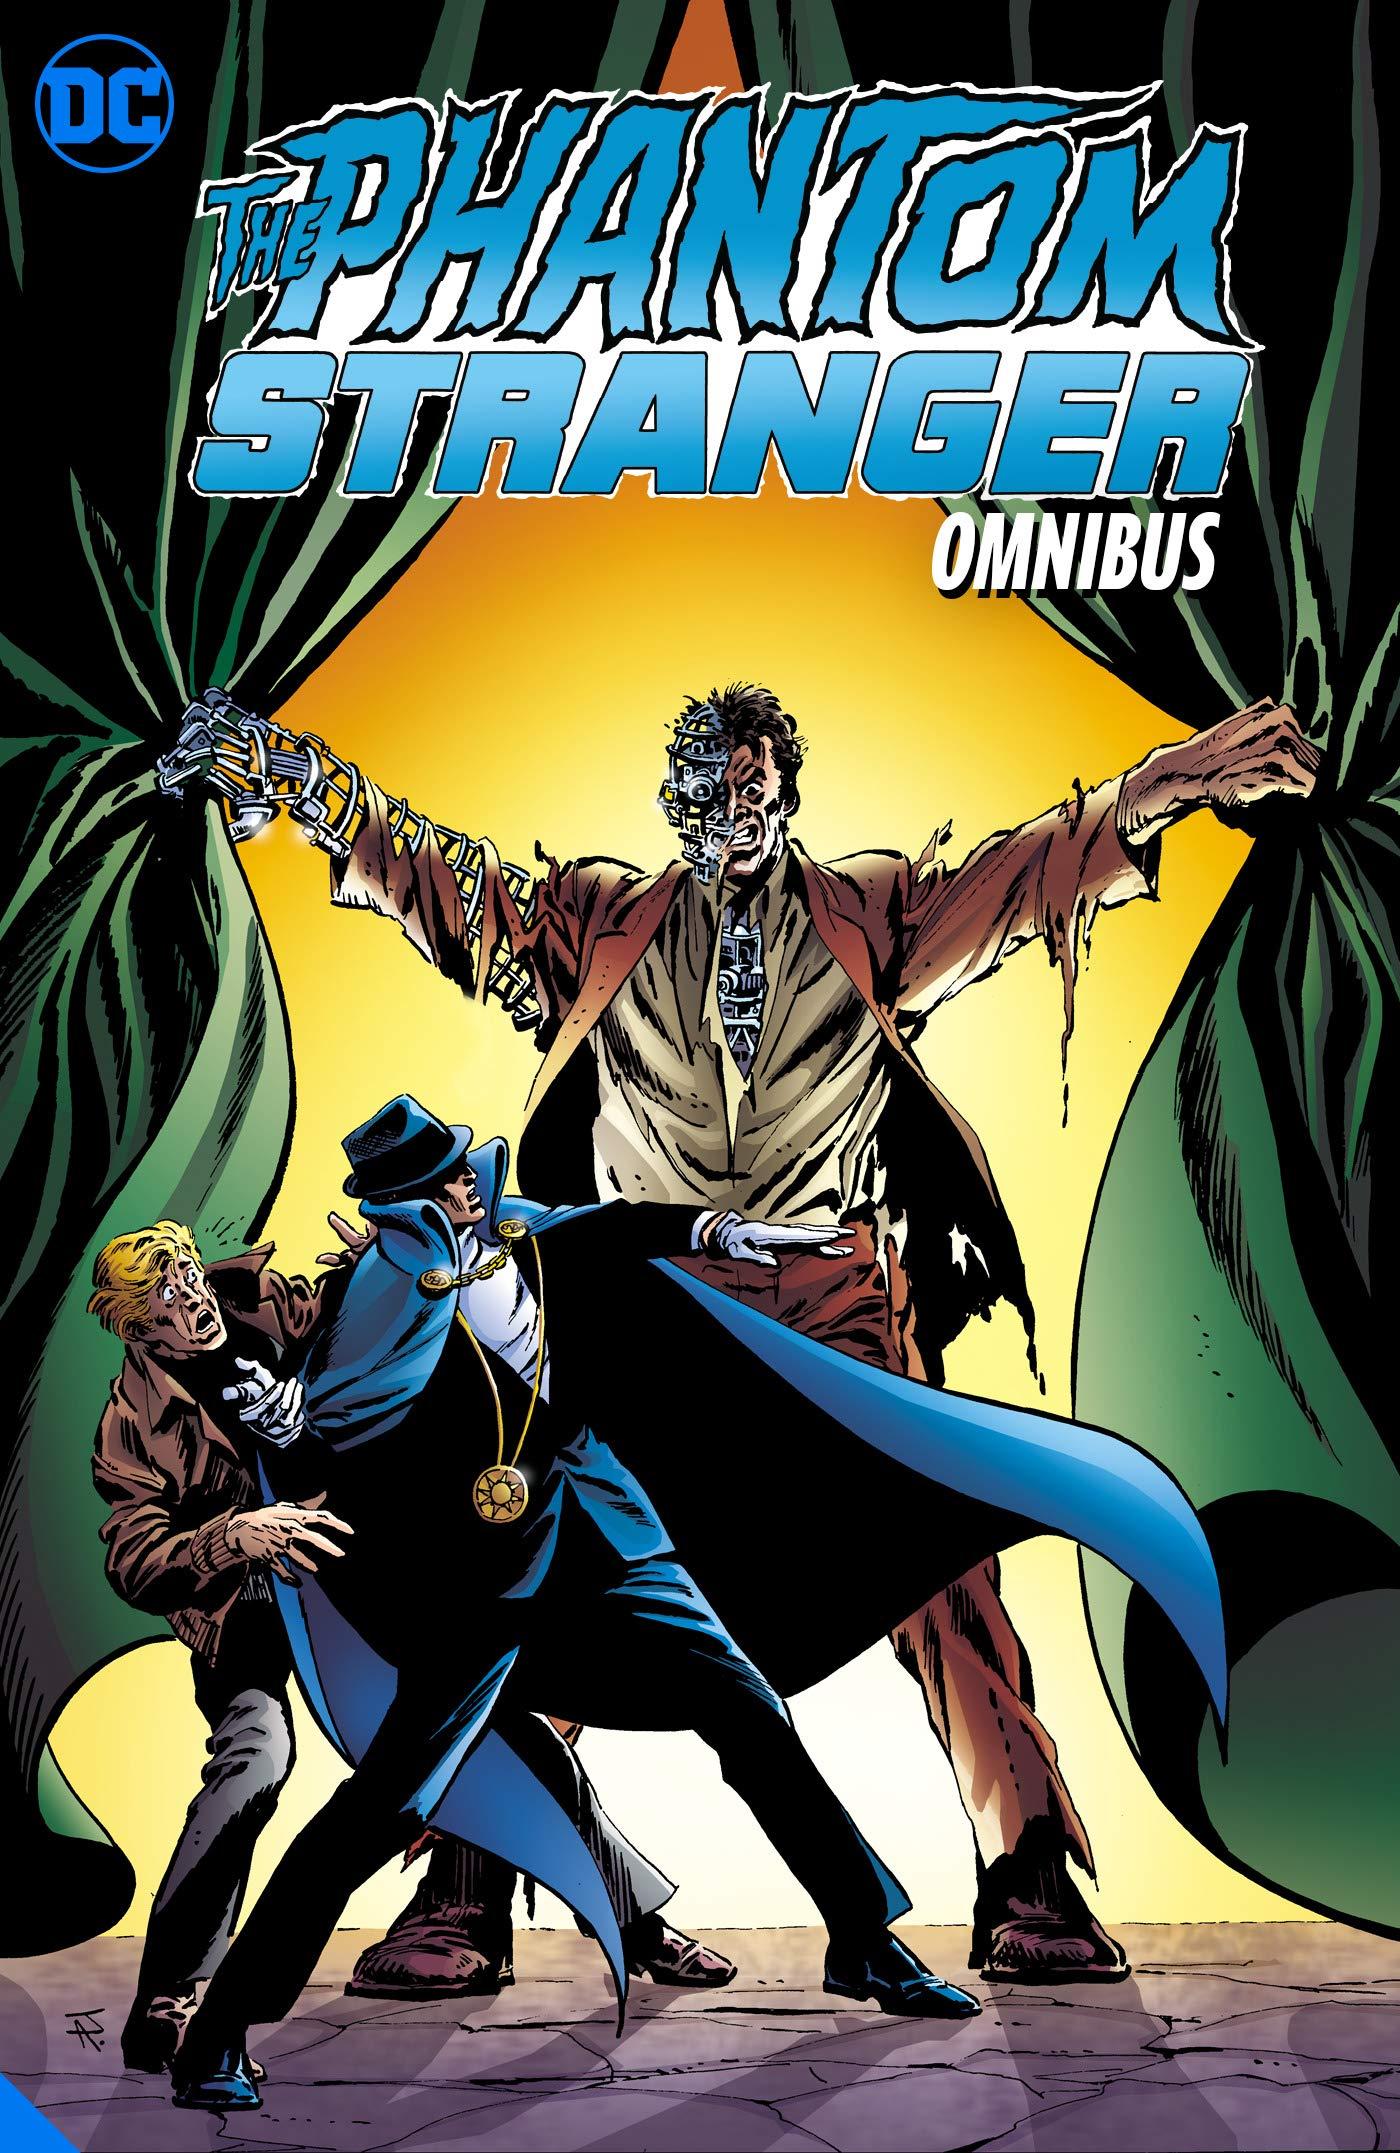 Amazon.com: Phantom Stranger Omnibus: 9781779506030: Various: Books